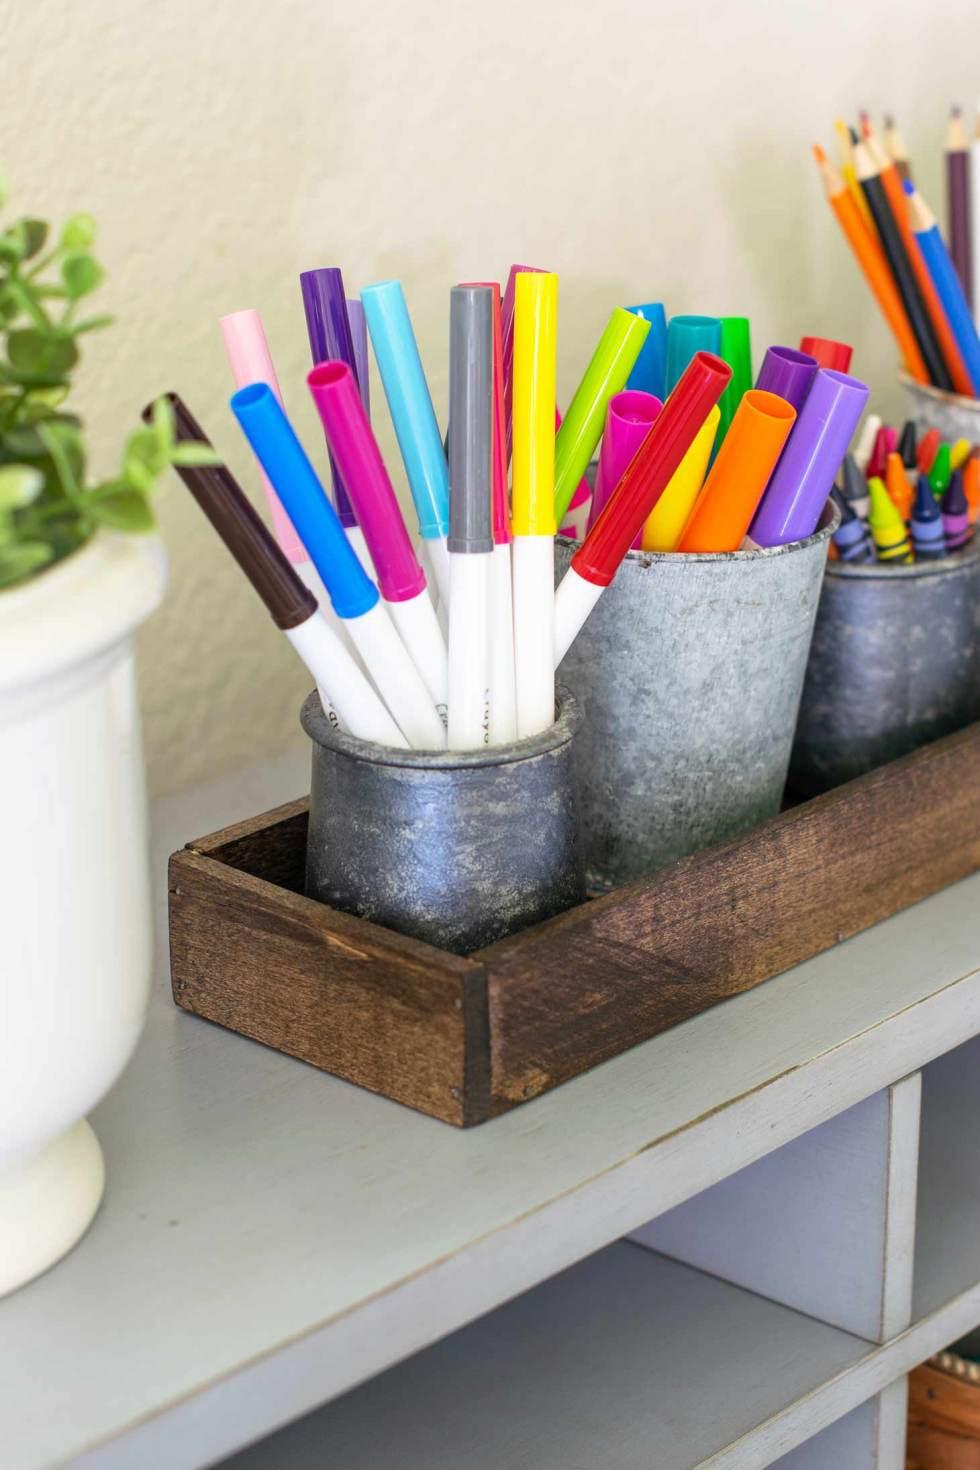 make back to school organization easy with this DIY organizer